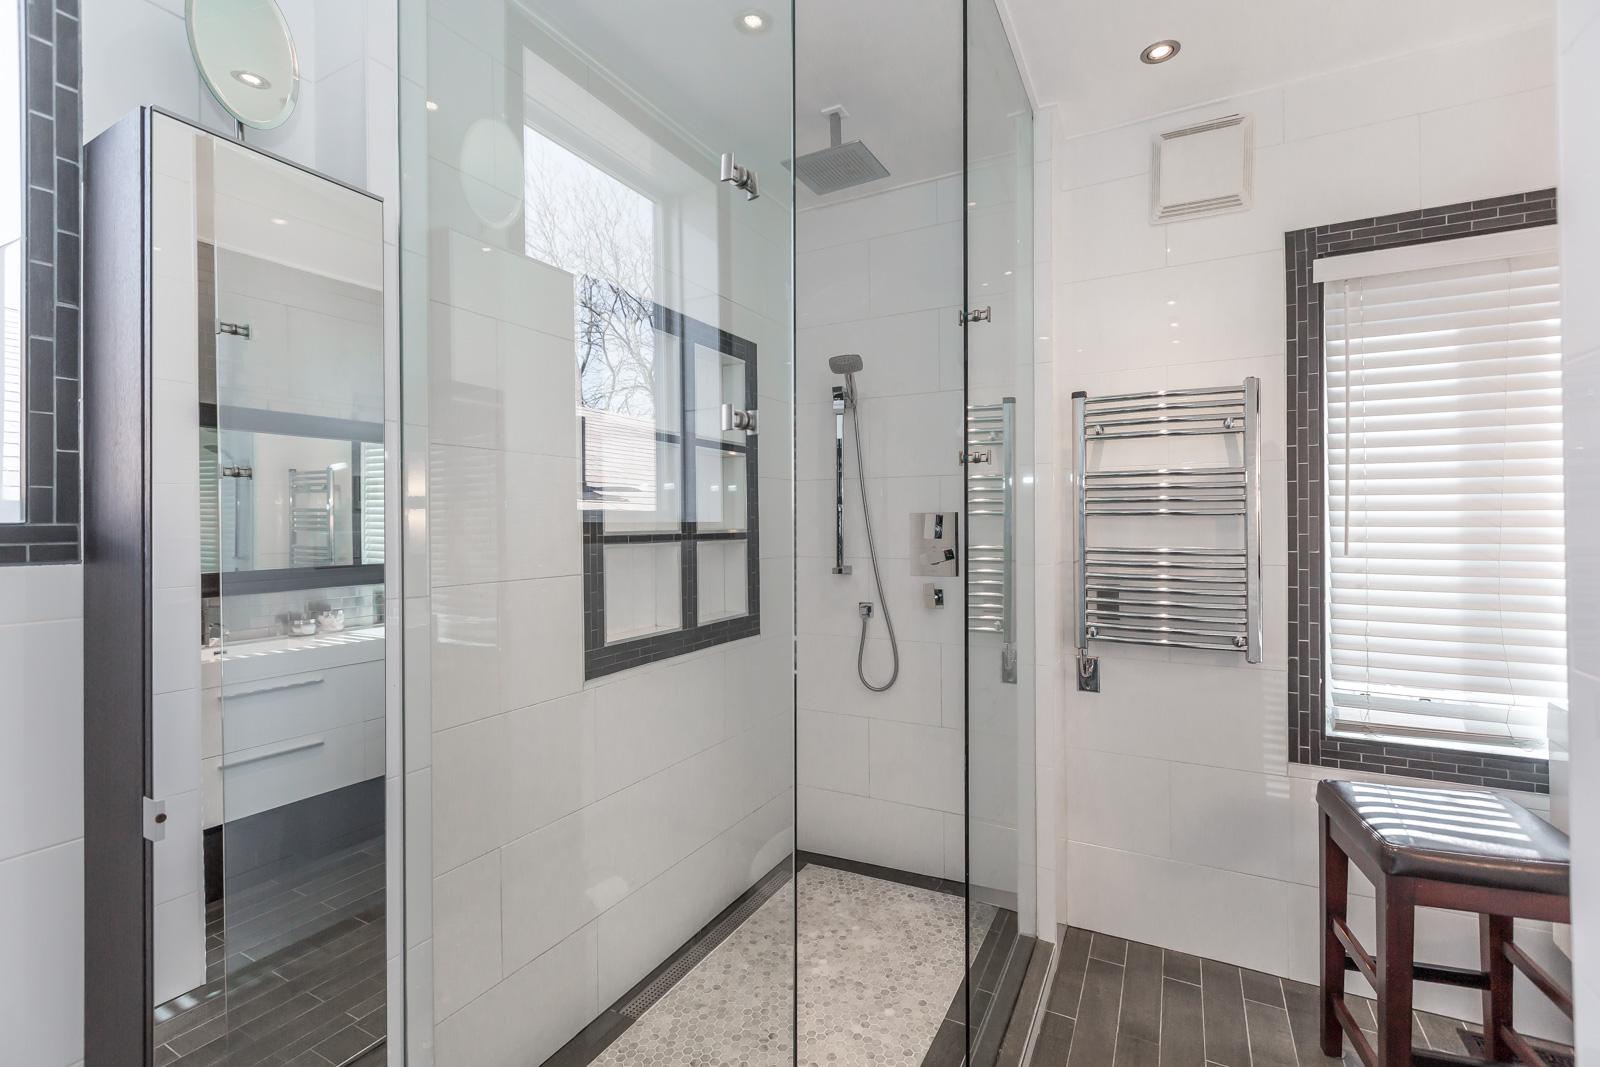 Toronto shower with rain showerhead